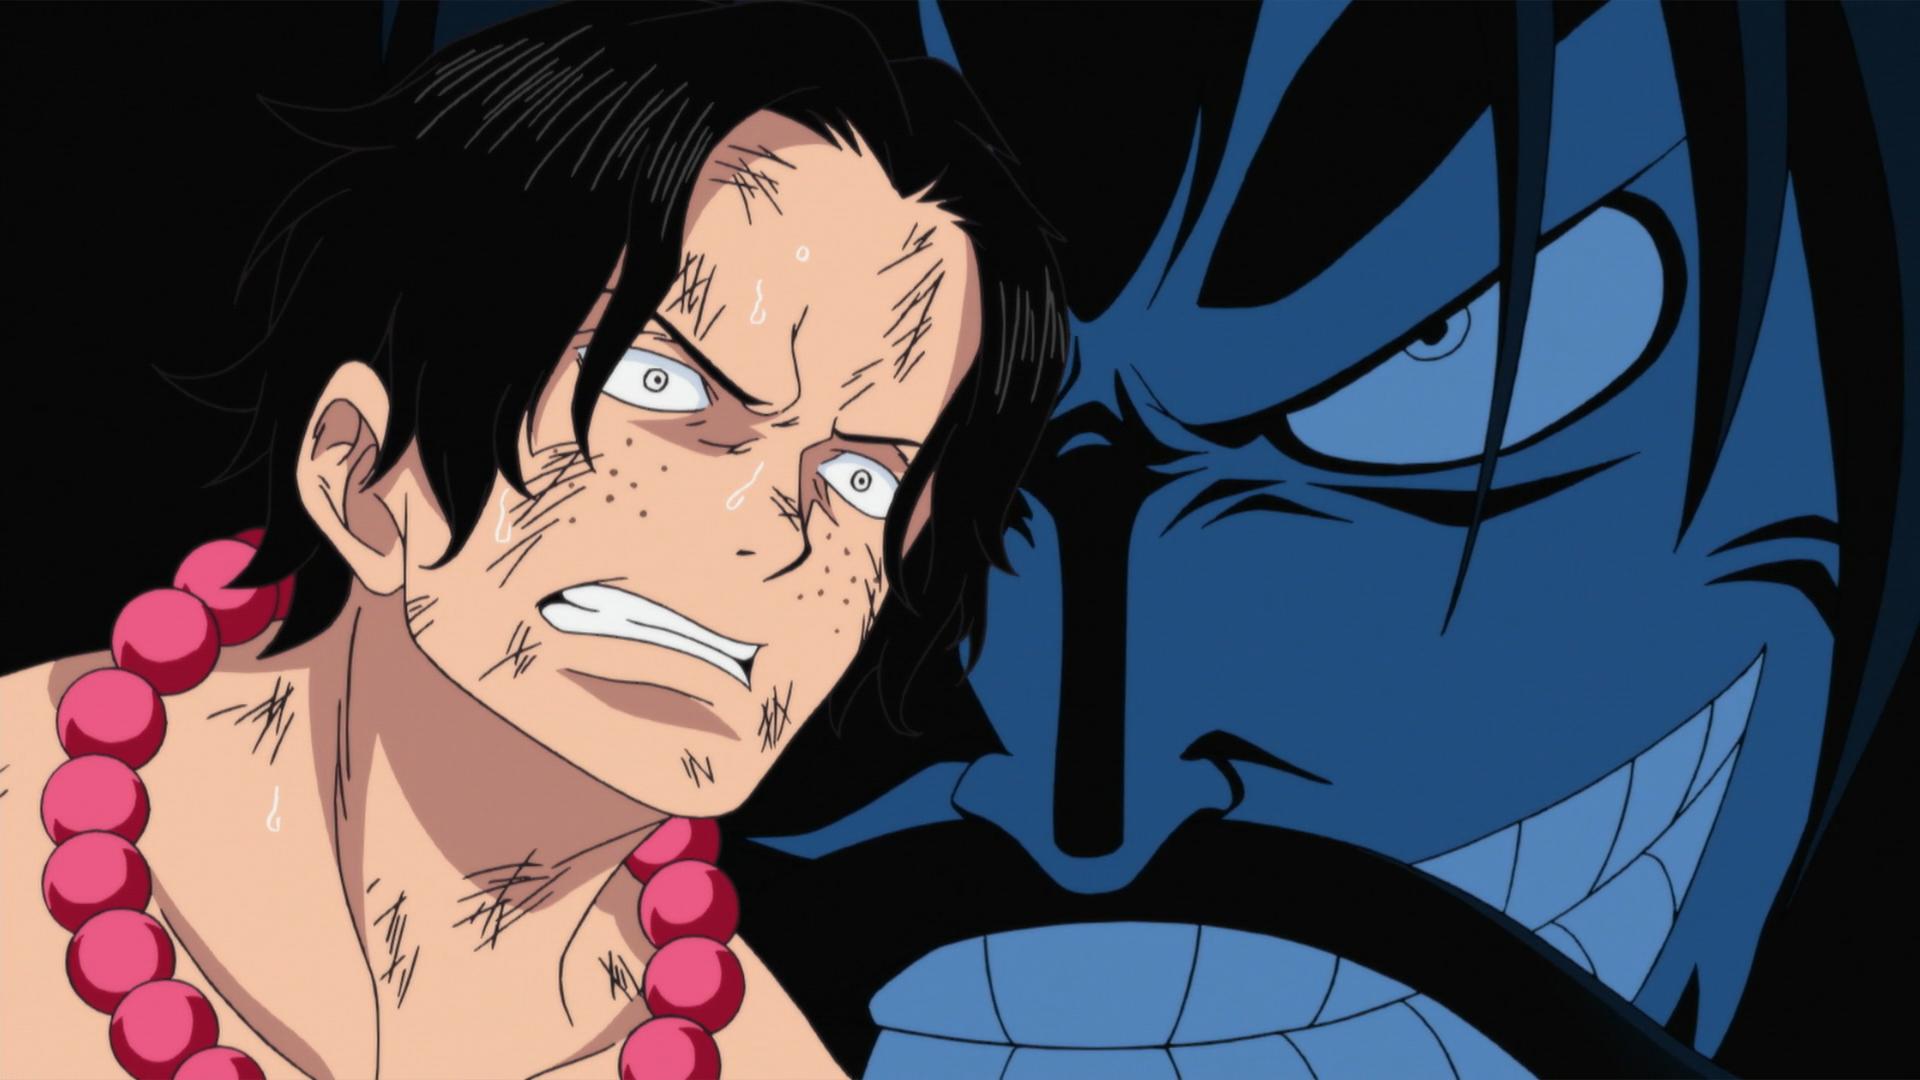 Will of the D. | One Piece Wiki | FANDOM powered by Wikia